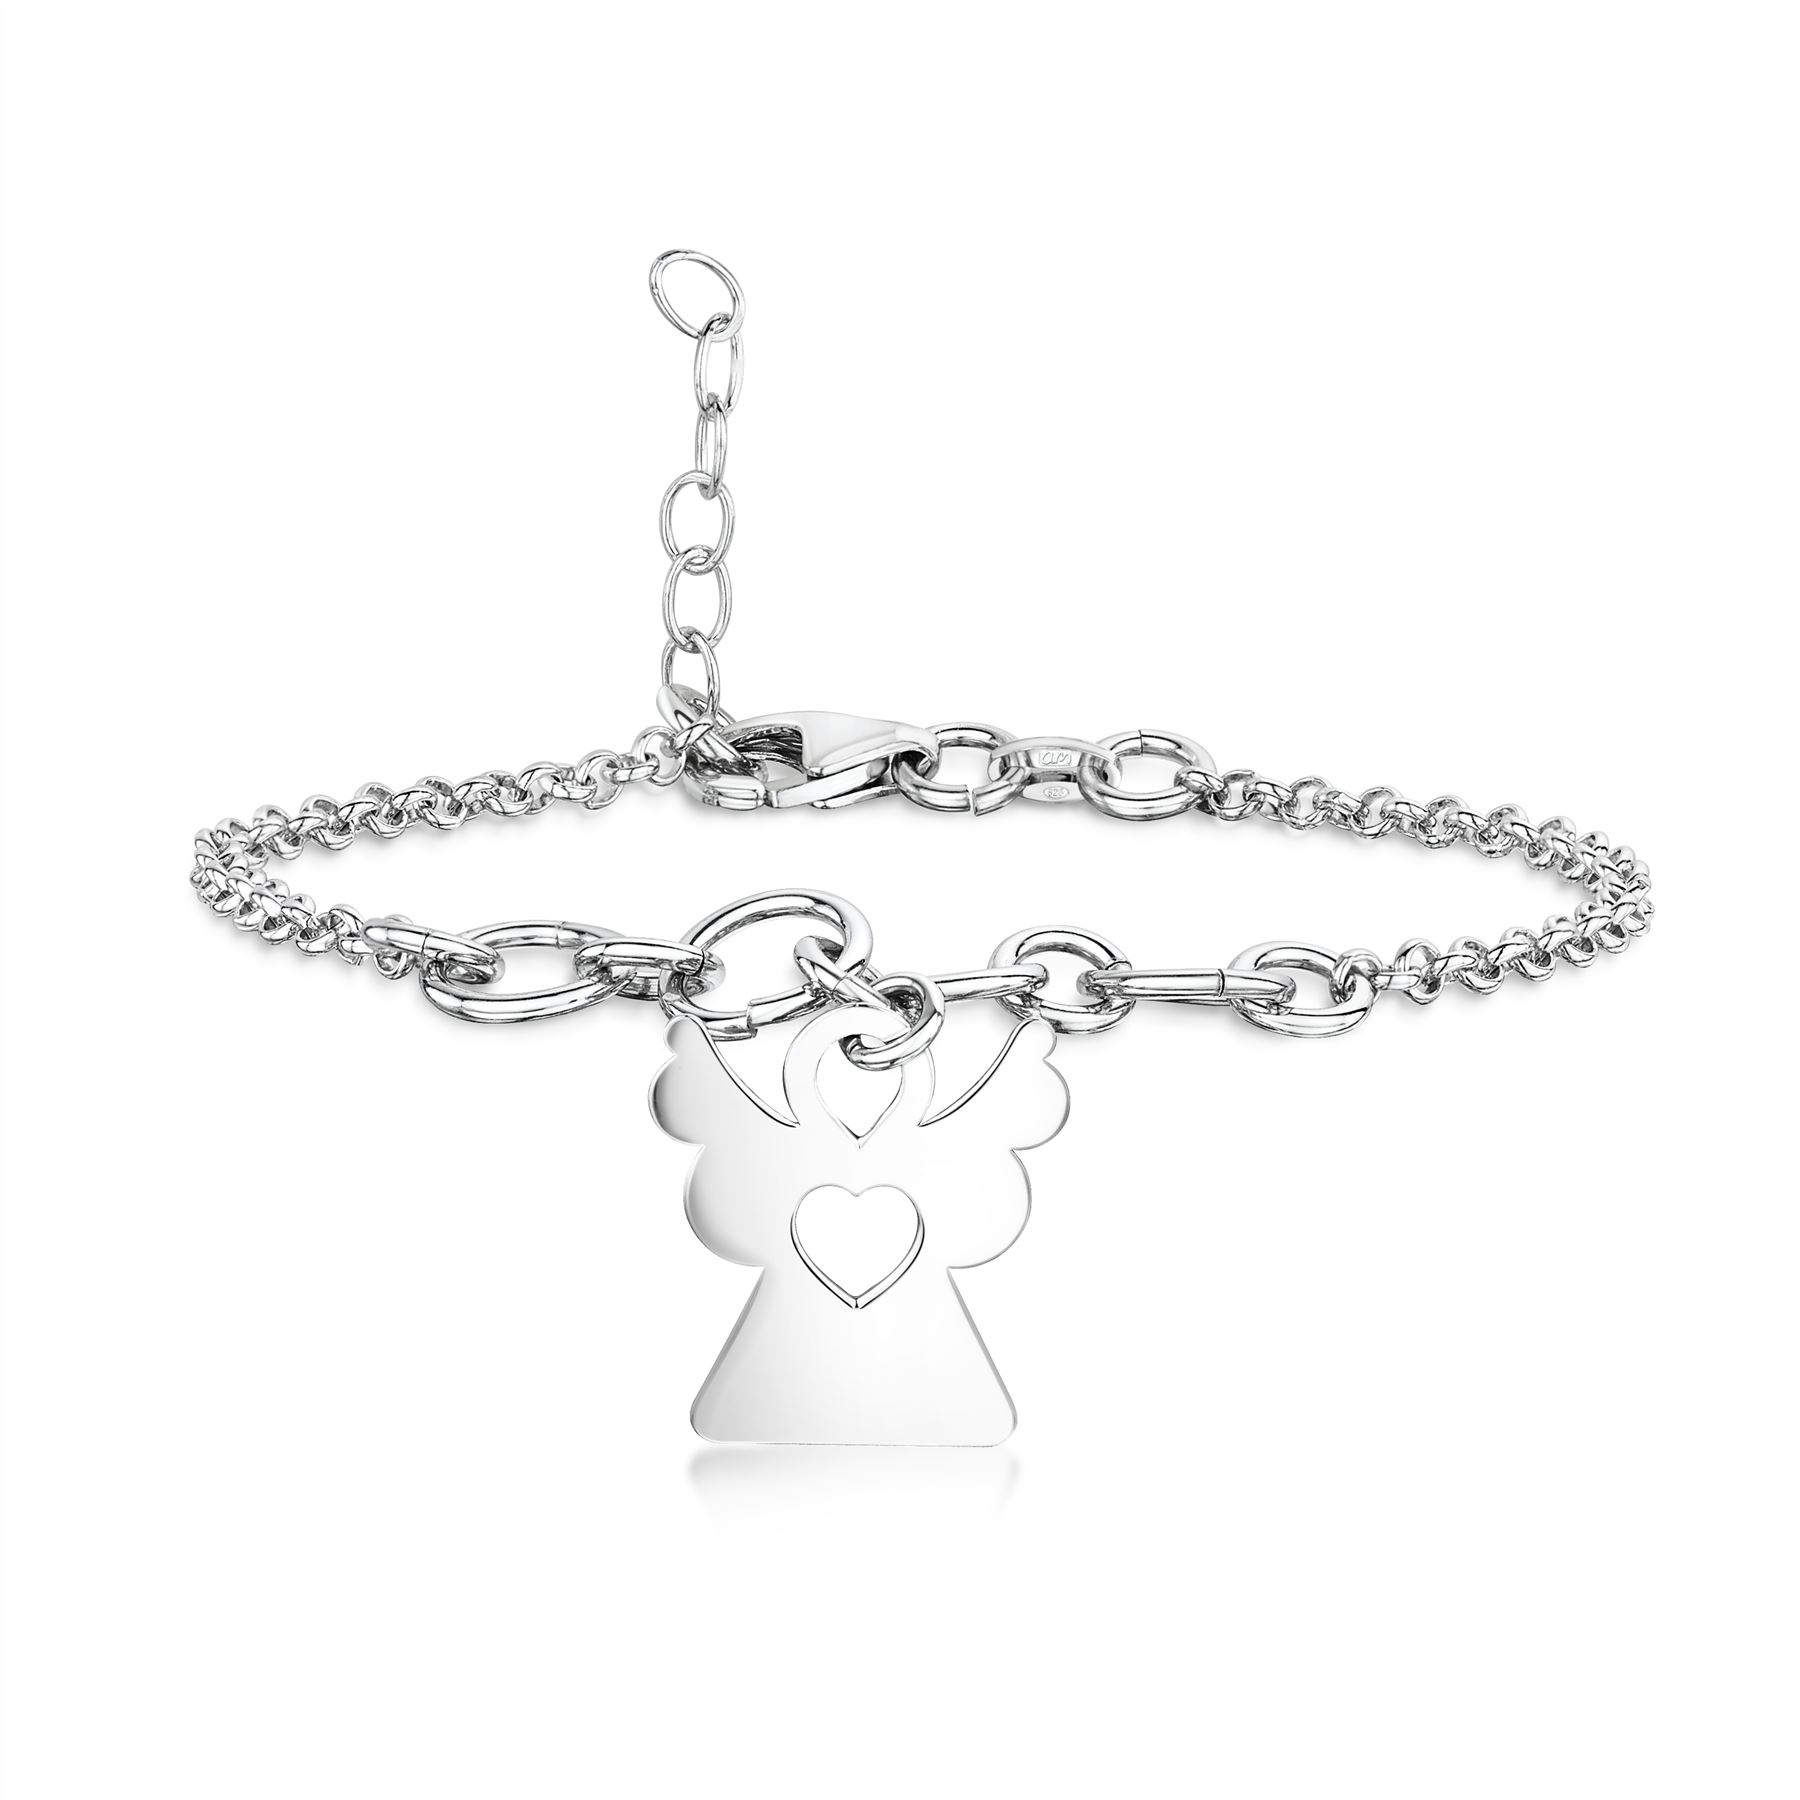 Amberta-Jewelry-925-Sterling-Silver-Adjustable-Bracelet-Italian-Bangle-for-Women miniature 66